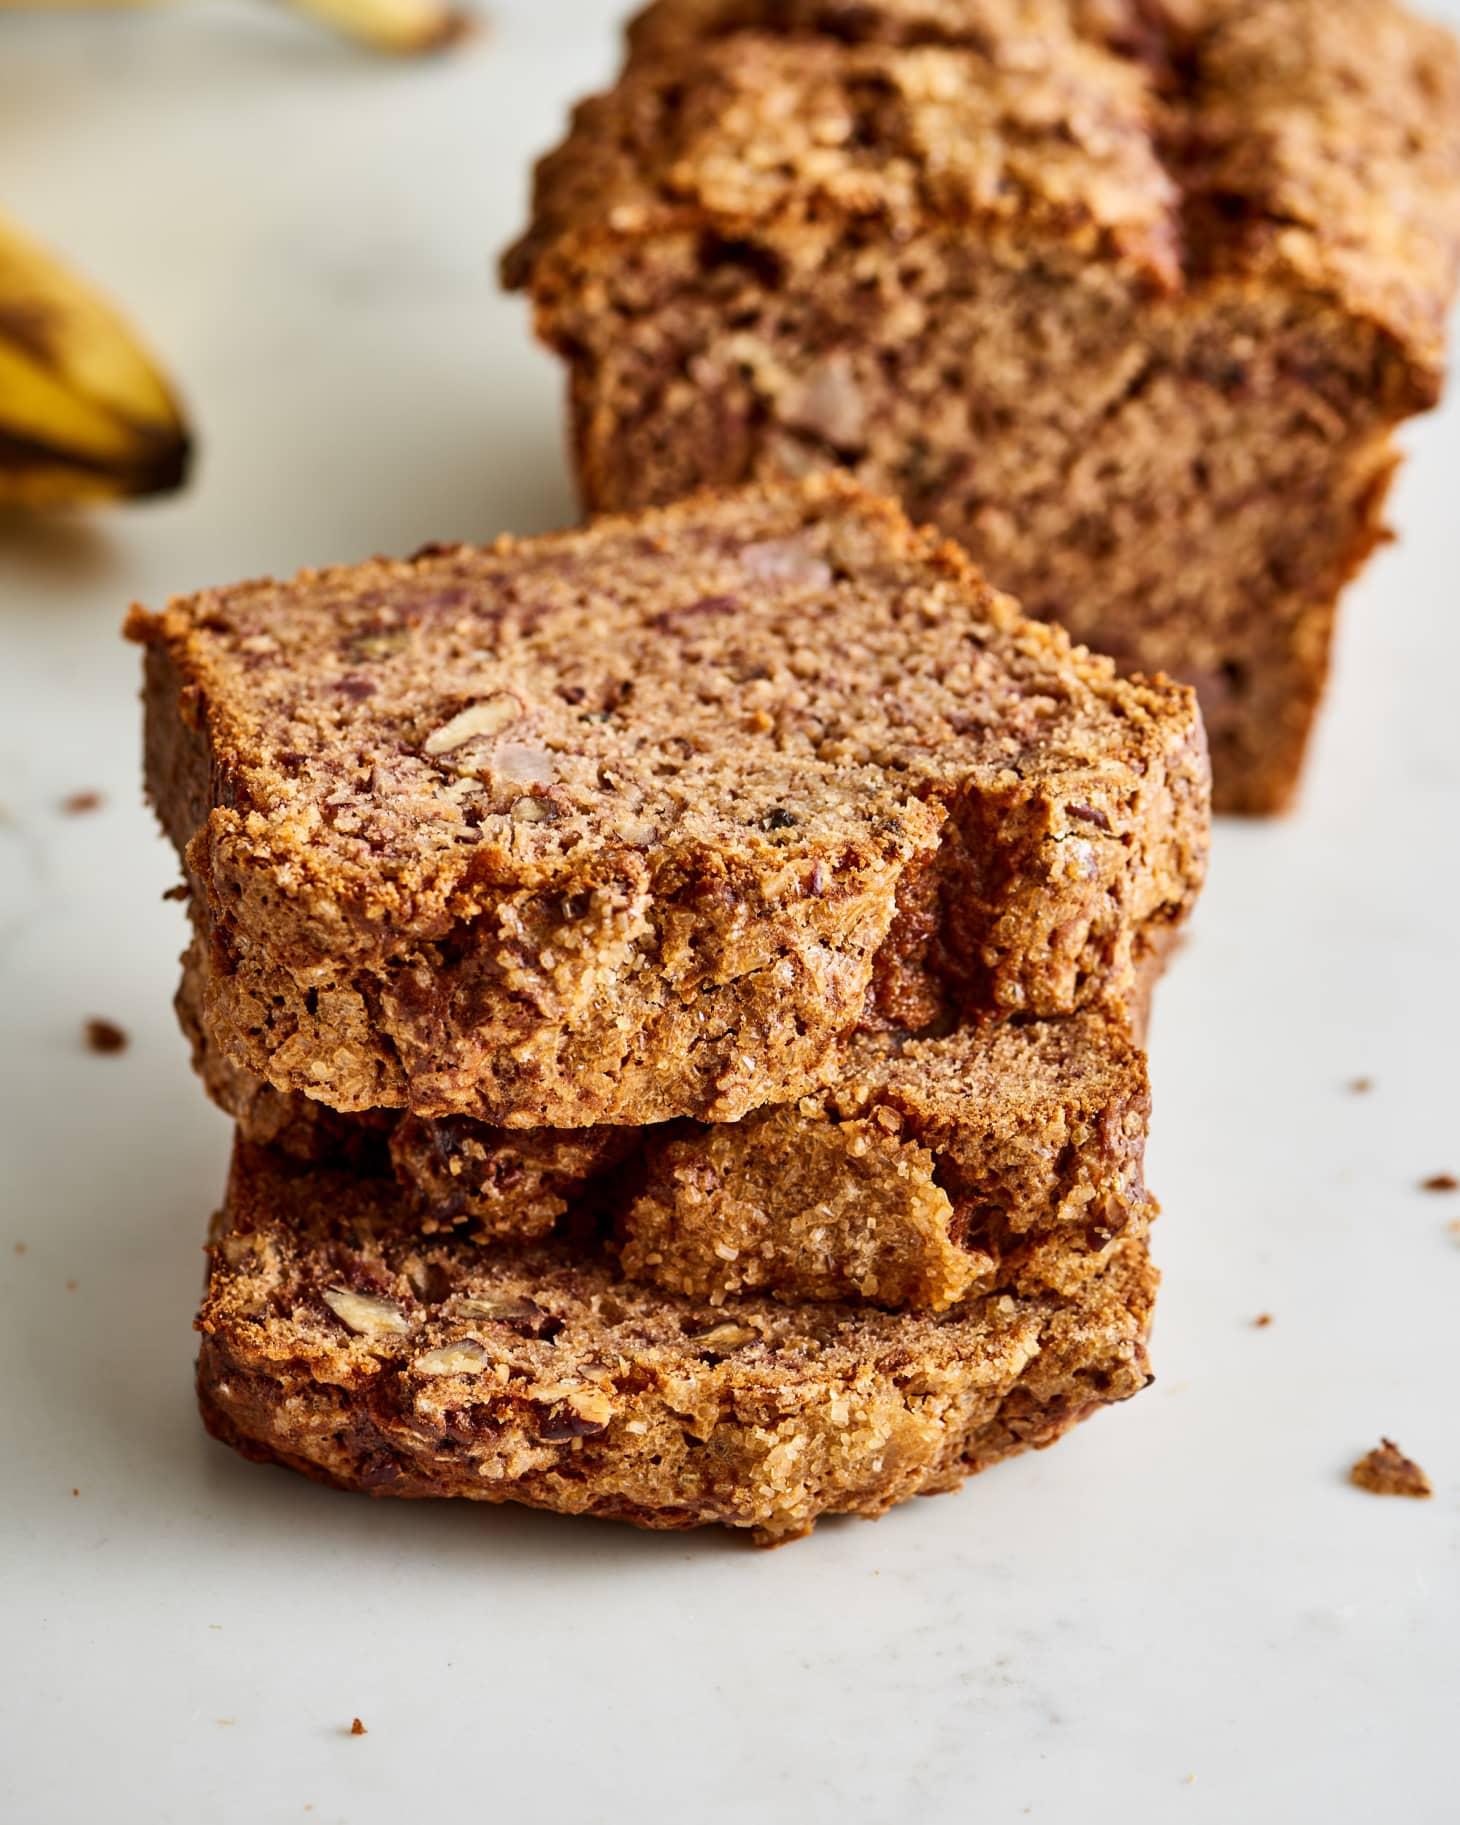 America's Test Kitchen Banana Bread Recipe Review